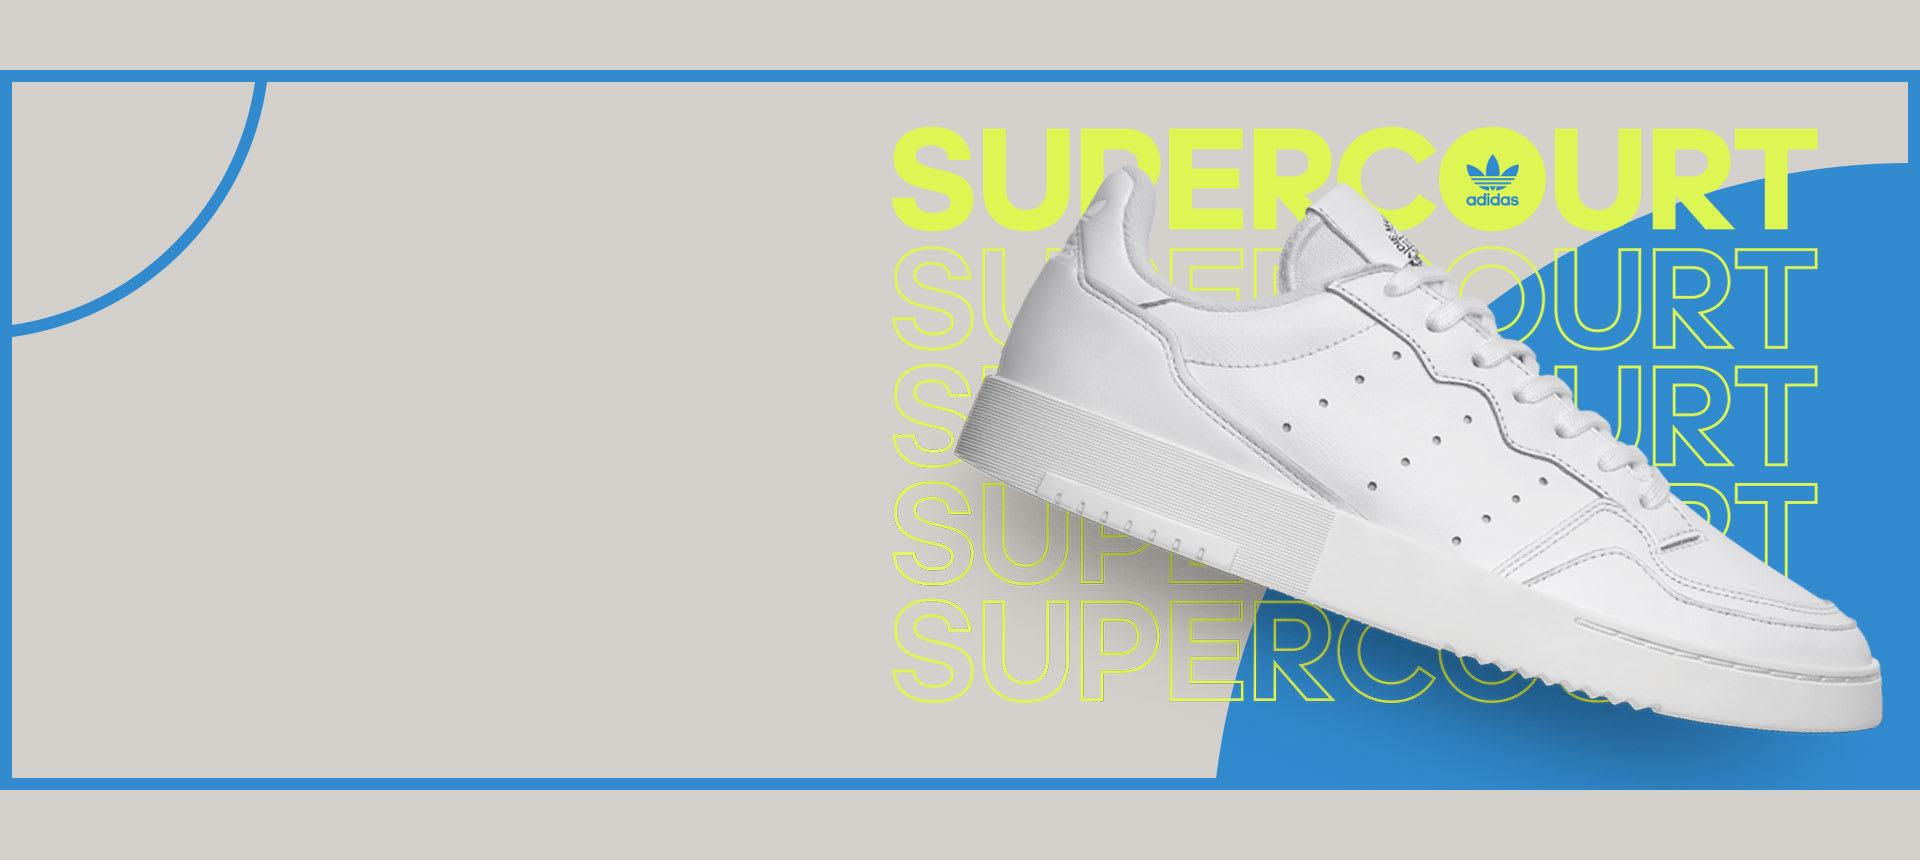 0471db9e94 adidas® Offizielle Website Deutschland |Sportbekleidung